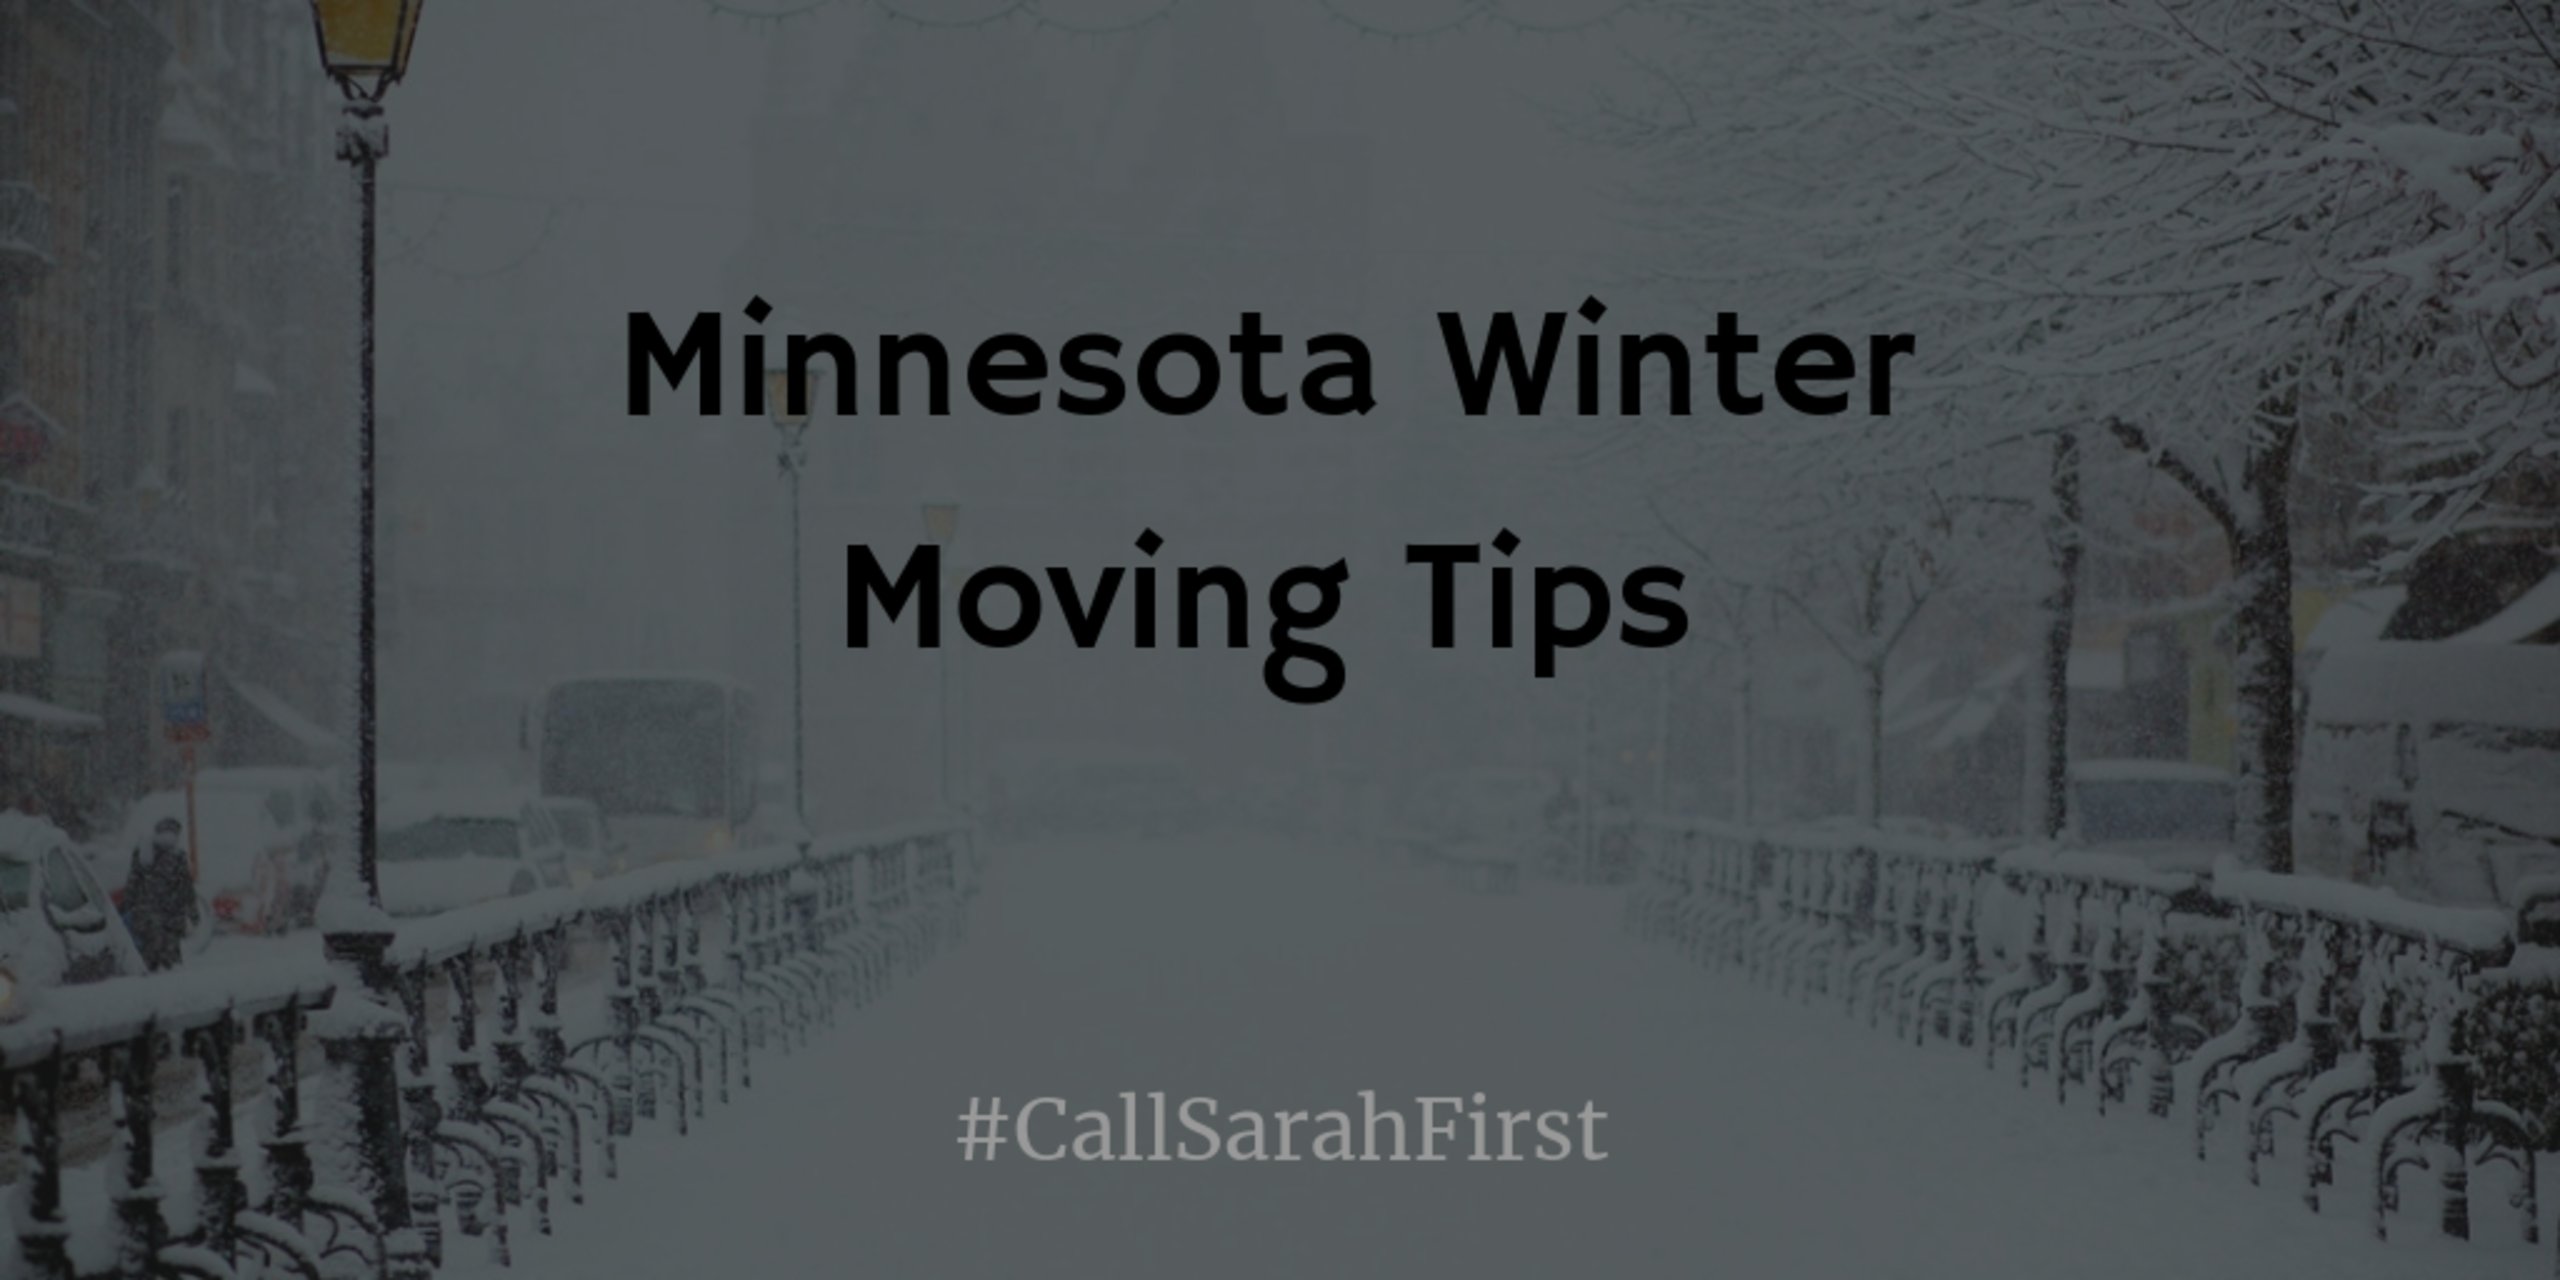 Minnesota Winter Moving Tips